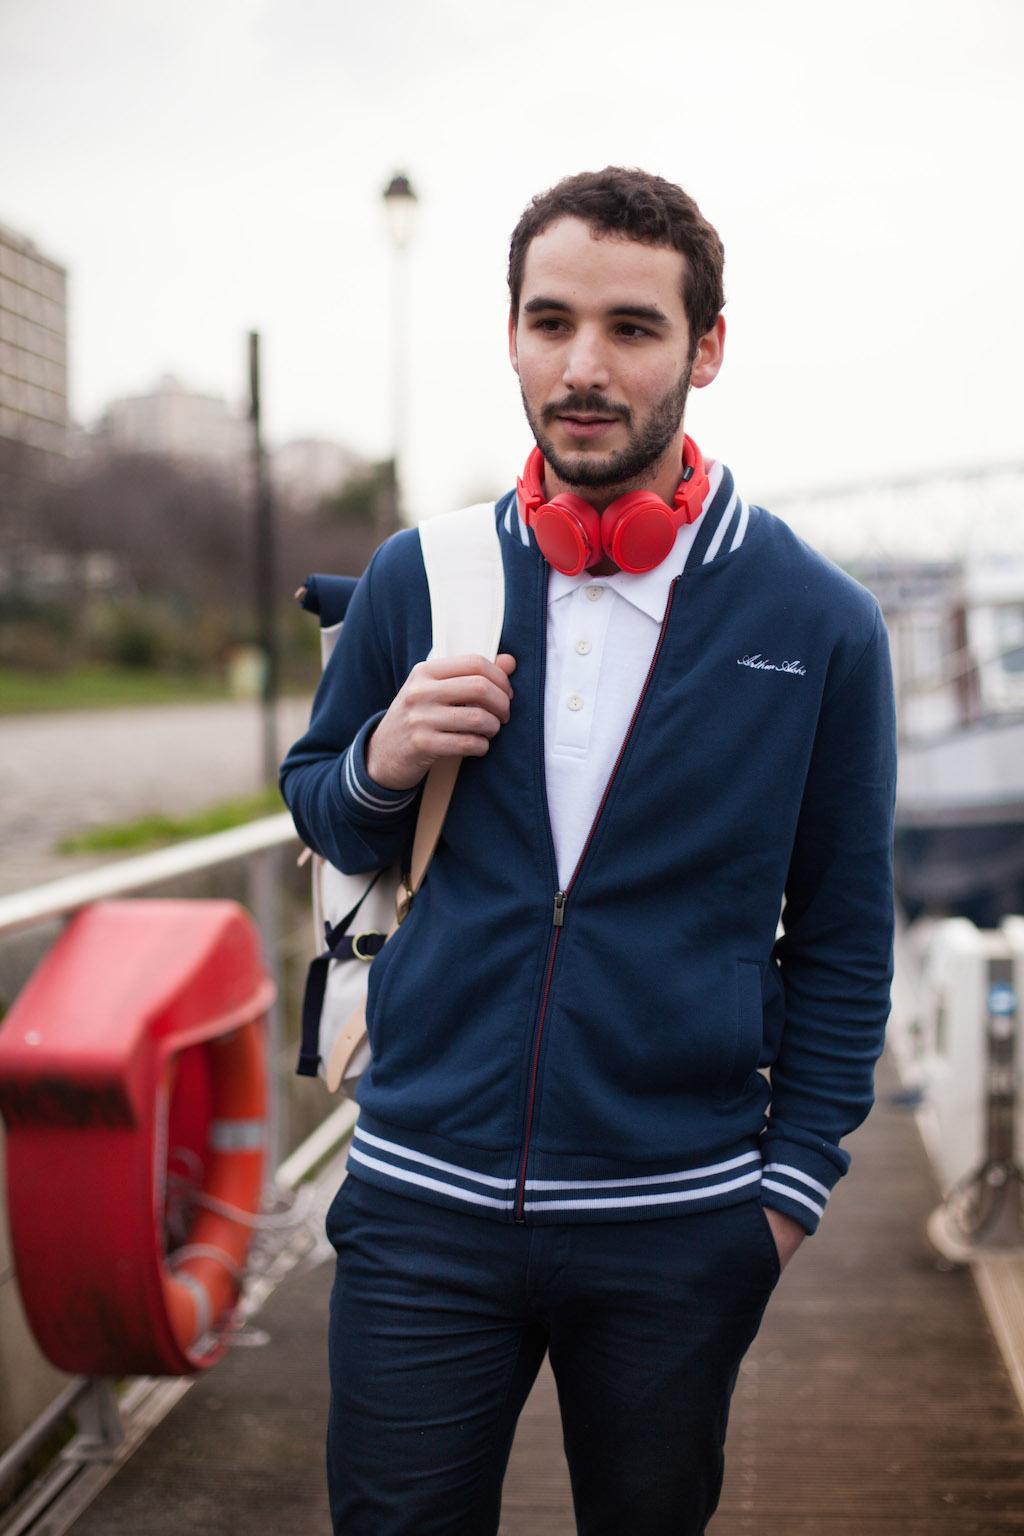 blog mode homme leblogdemonsieur lacoste celio lecoqsportif urbanears